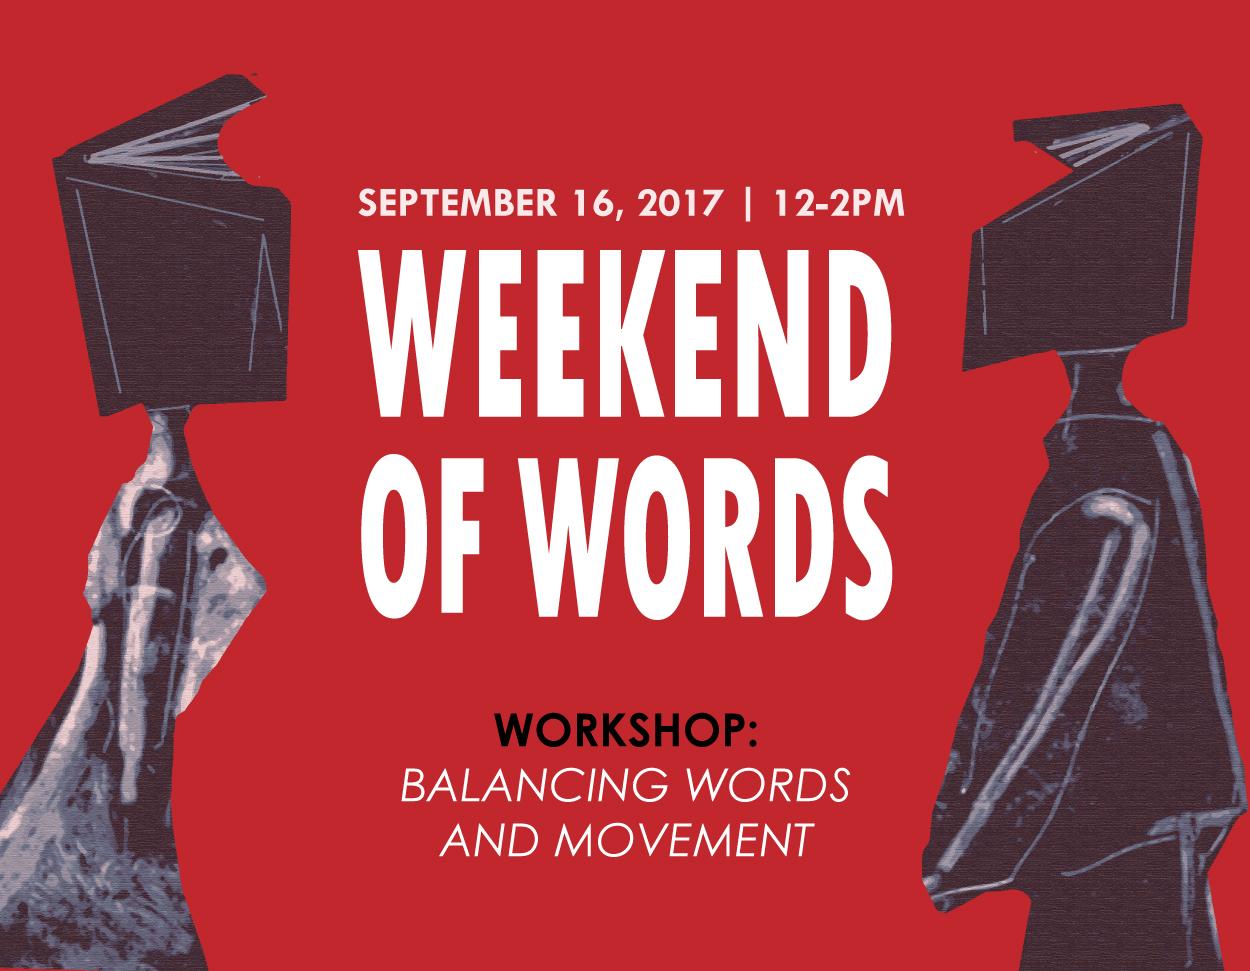 Balancing Words And Movement